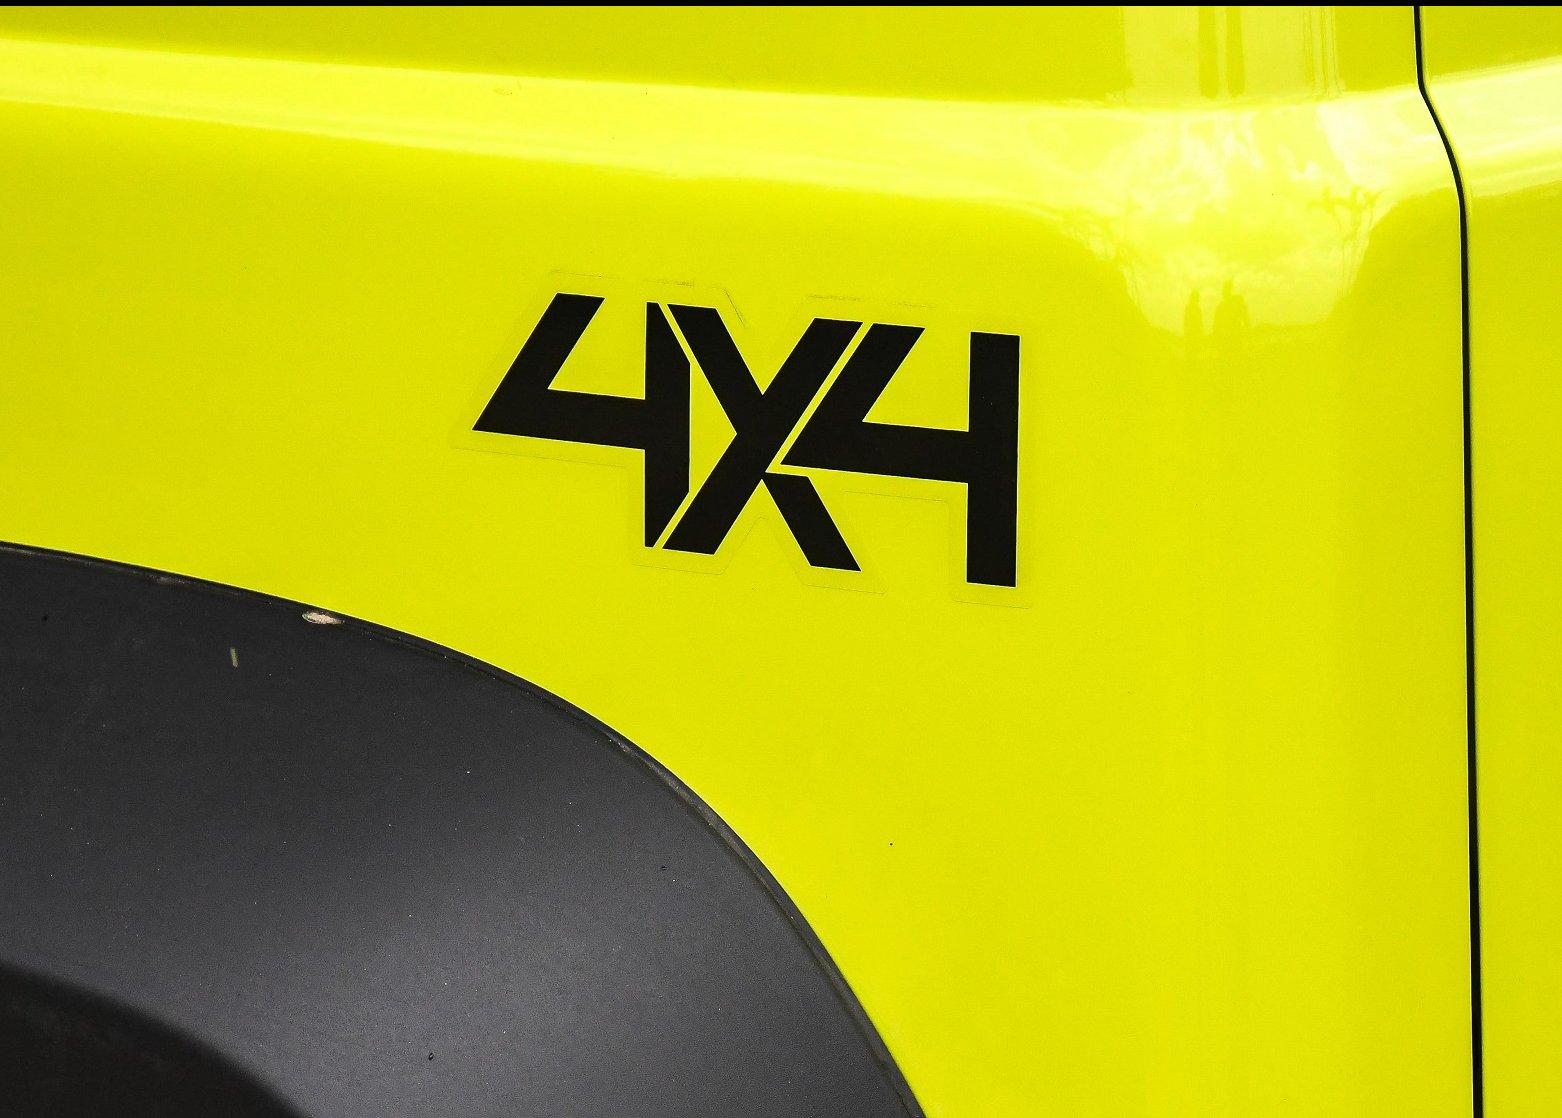 Emblema 4x4 perto do para-mlama traseiro do Jimny verde